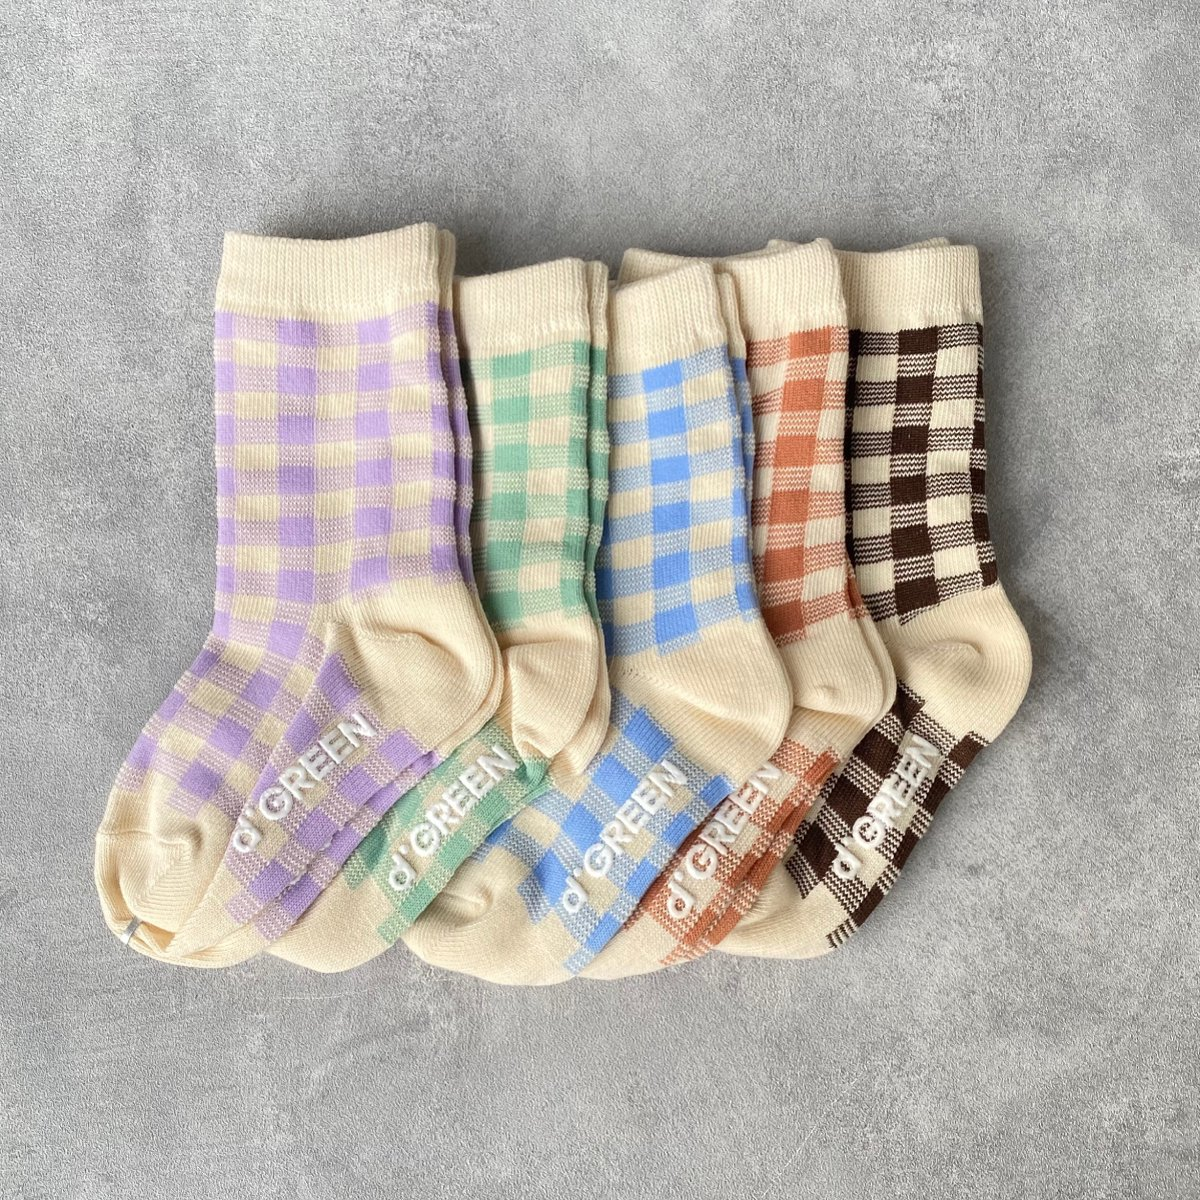 【BABY】Natural Check Socks 詳細画像6